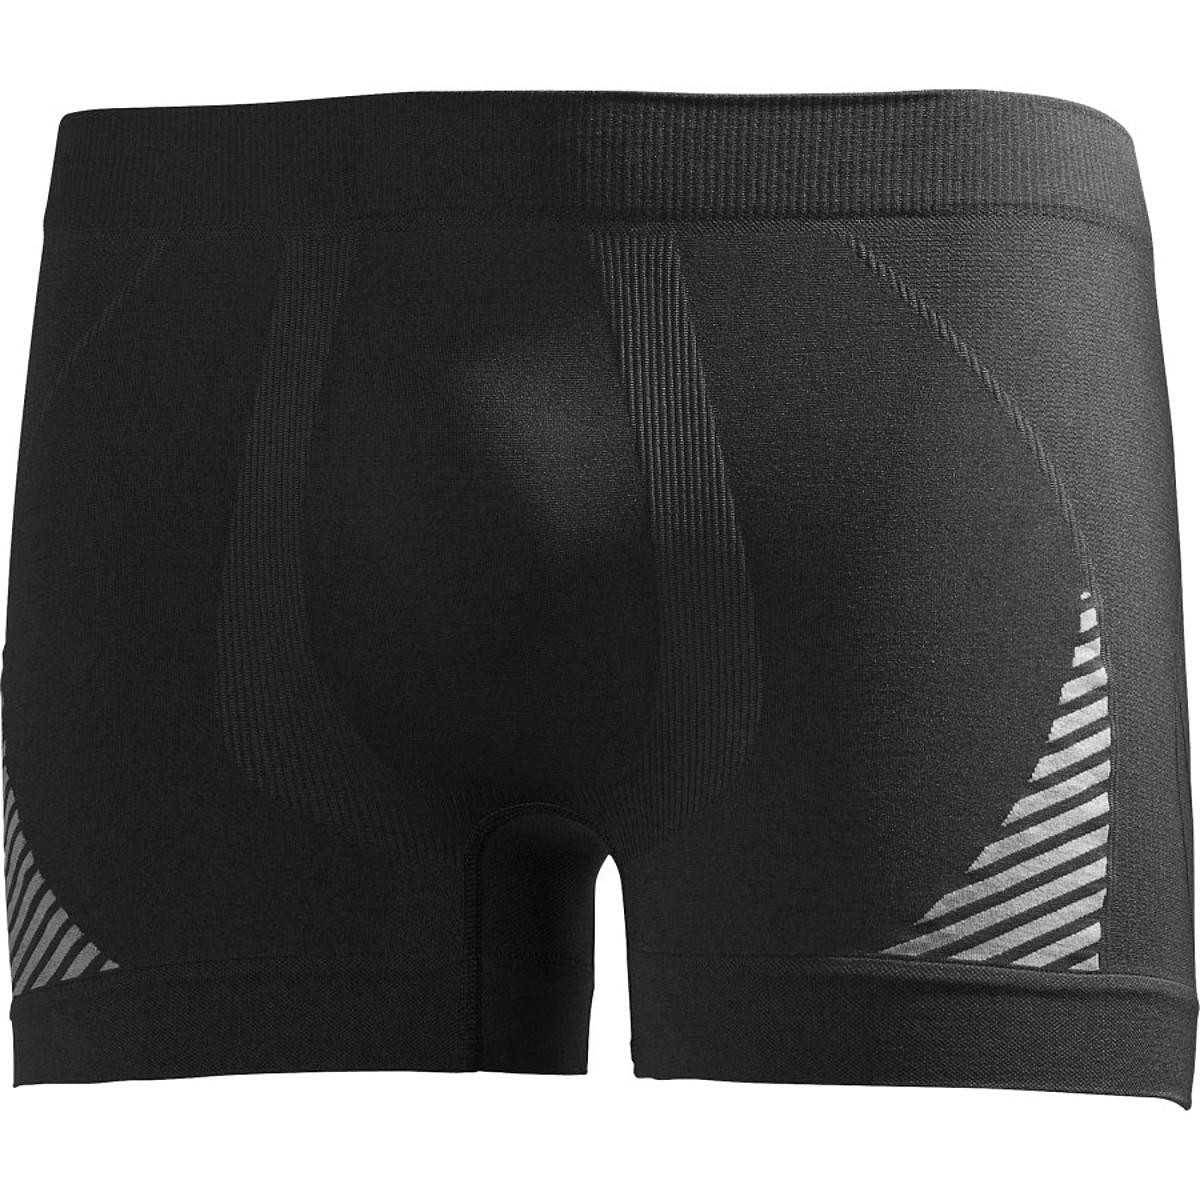 photo: Helly Hansen Dry Revolution Boxer boxers, briefs, bikini